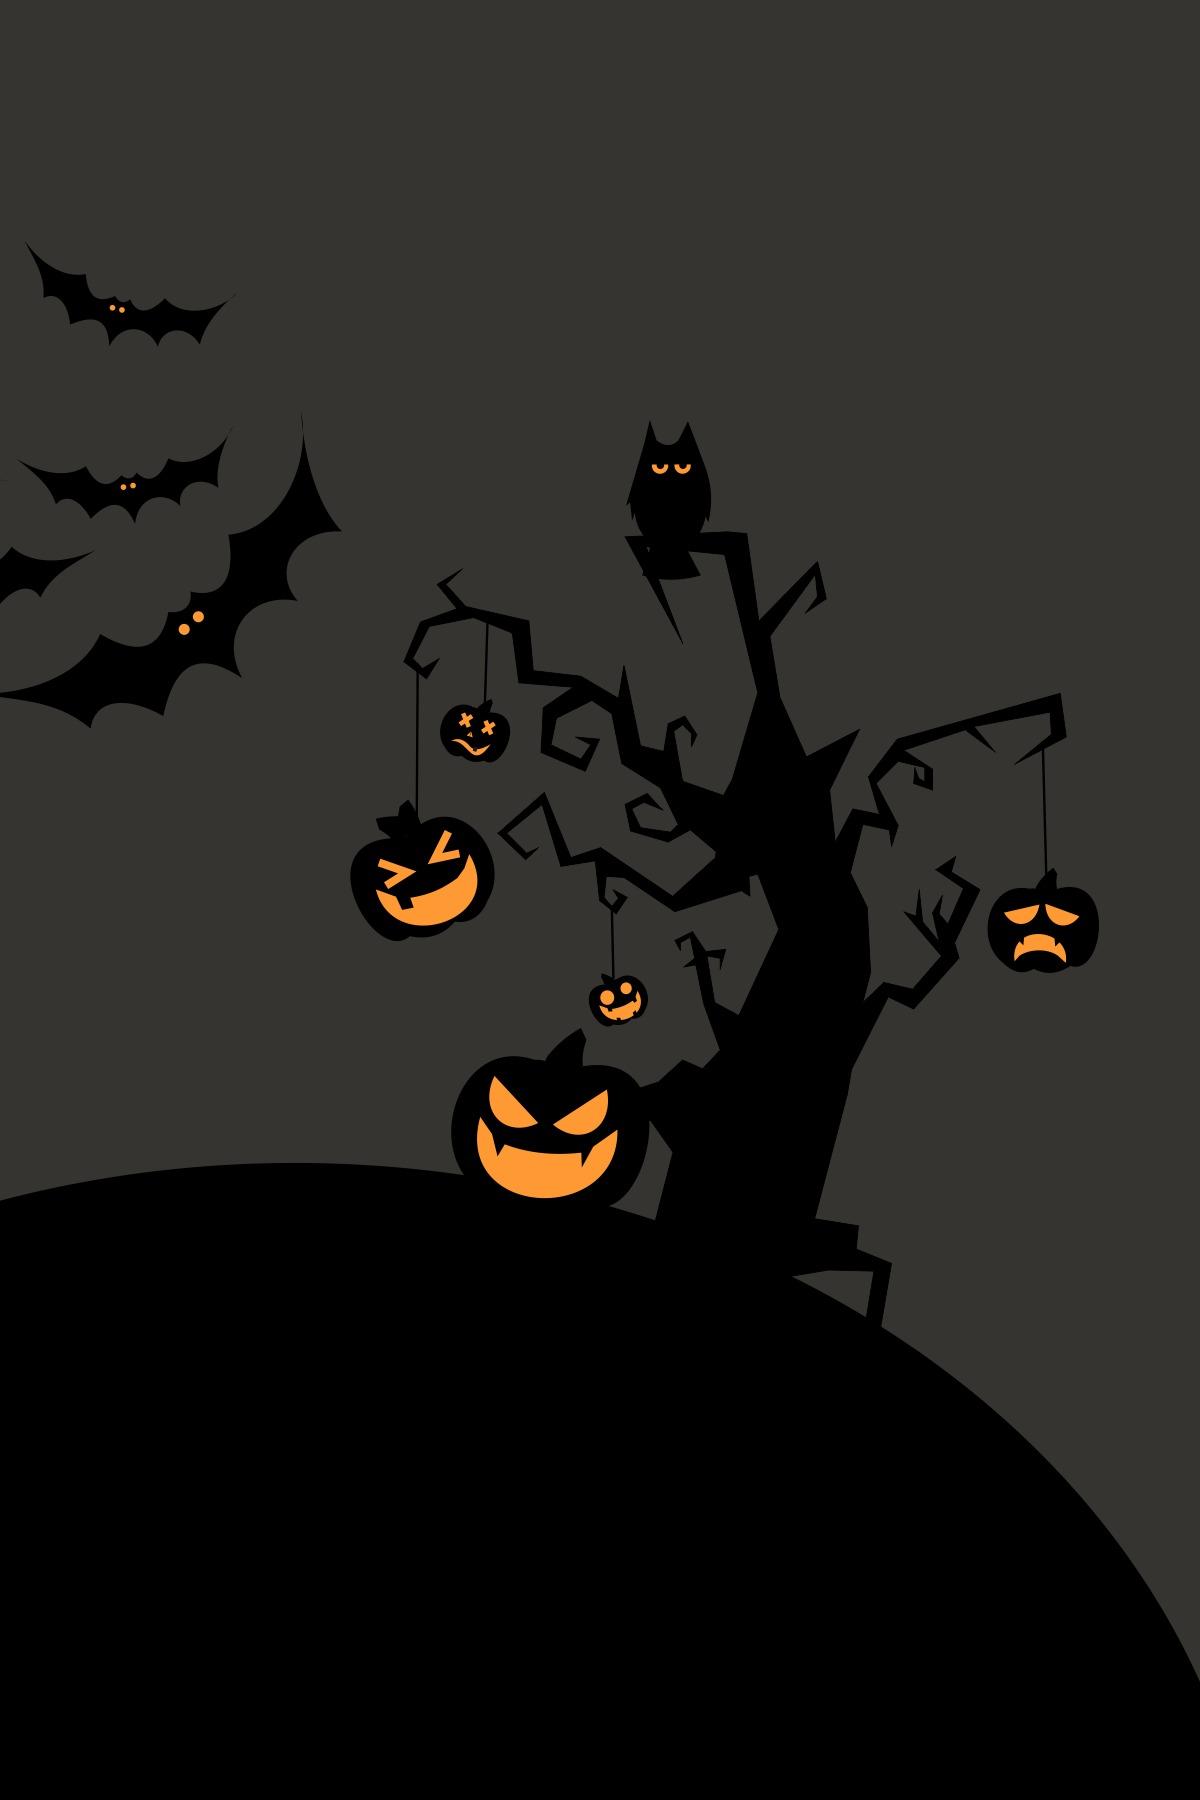 halloween silhouette moon eerie pumpkin bat scary lantern fright